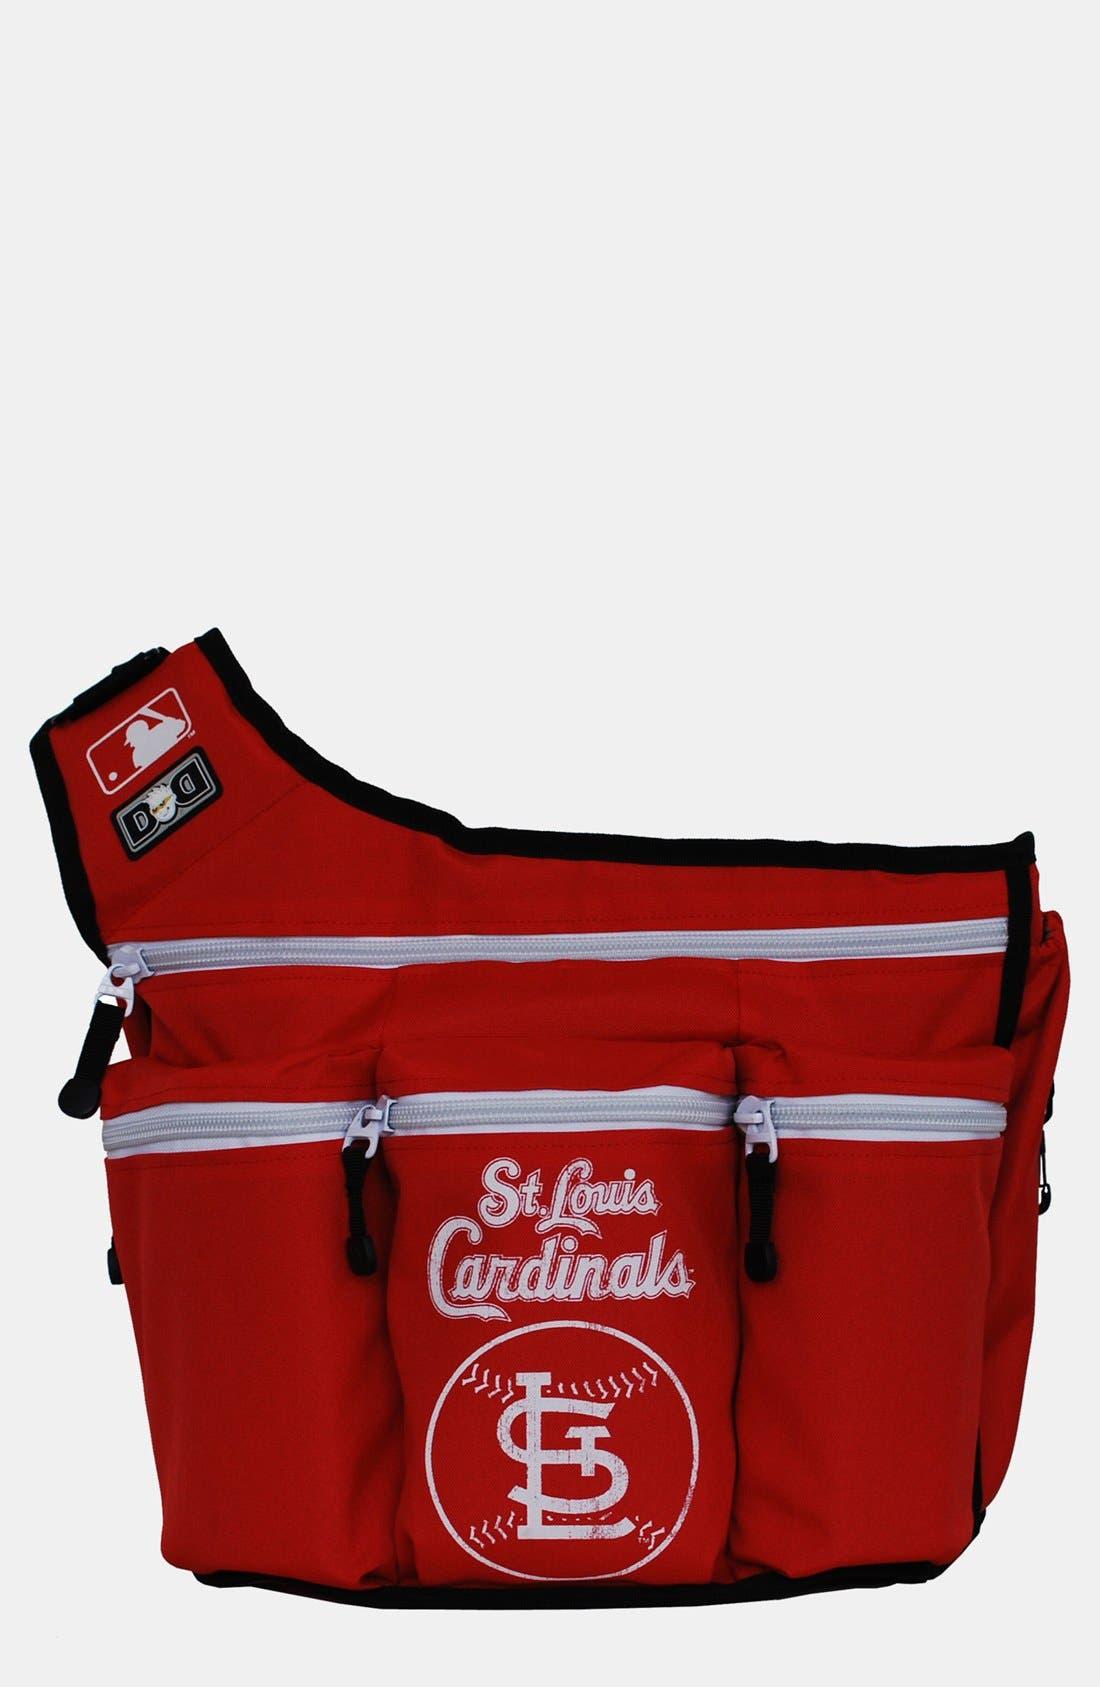 Diaper Dude 'St. Louis Cardinals' Messenger Diaper Bag